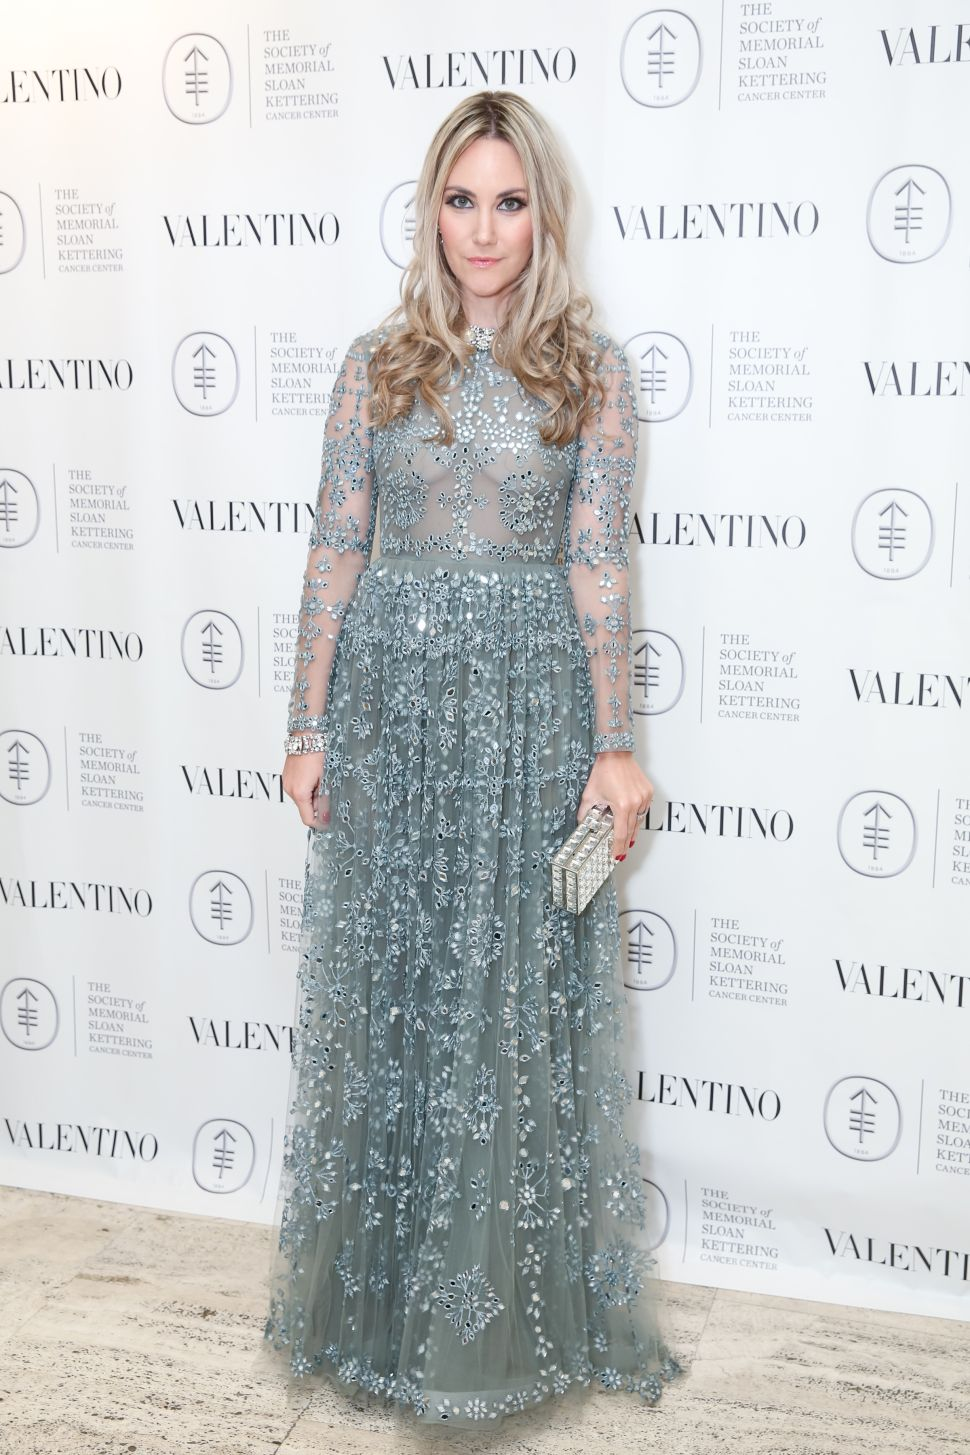 Elizabeth Kurpis wearing Valentino (Photo: The Society of MSKCC).